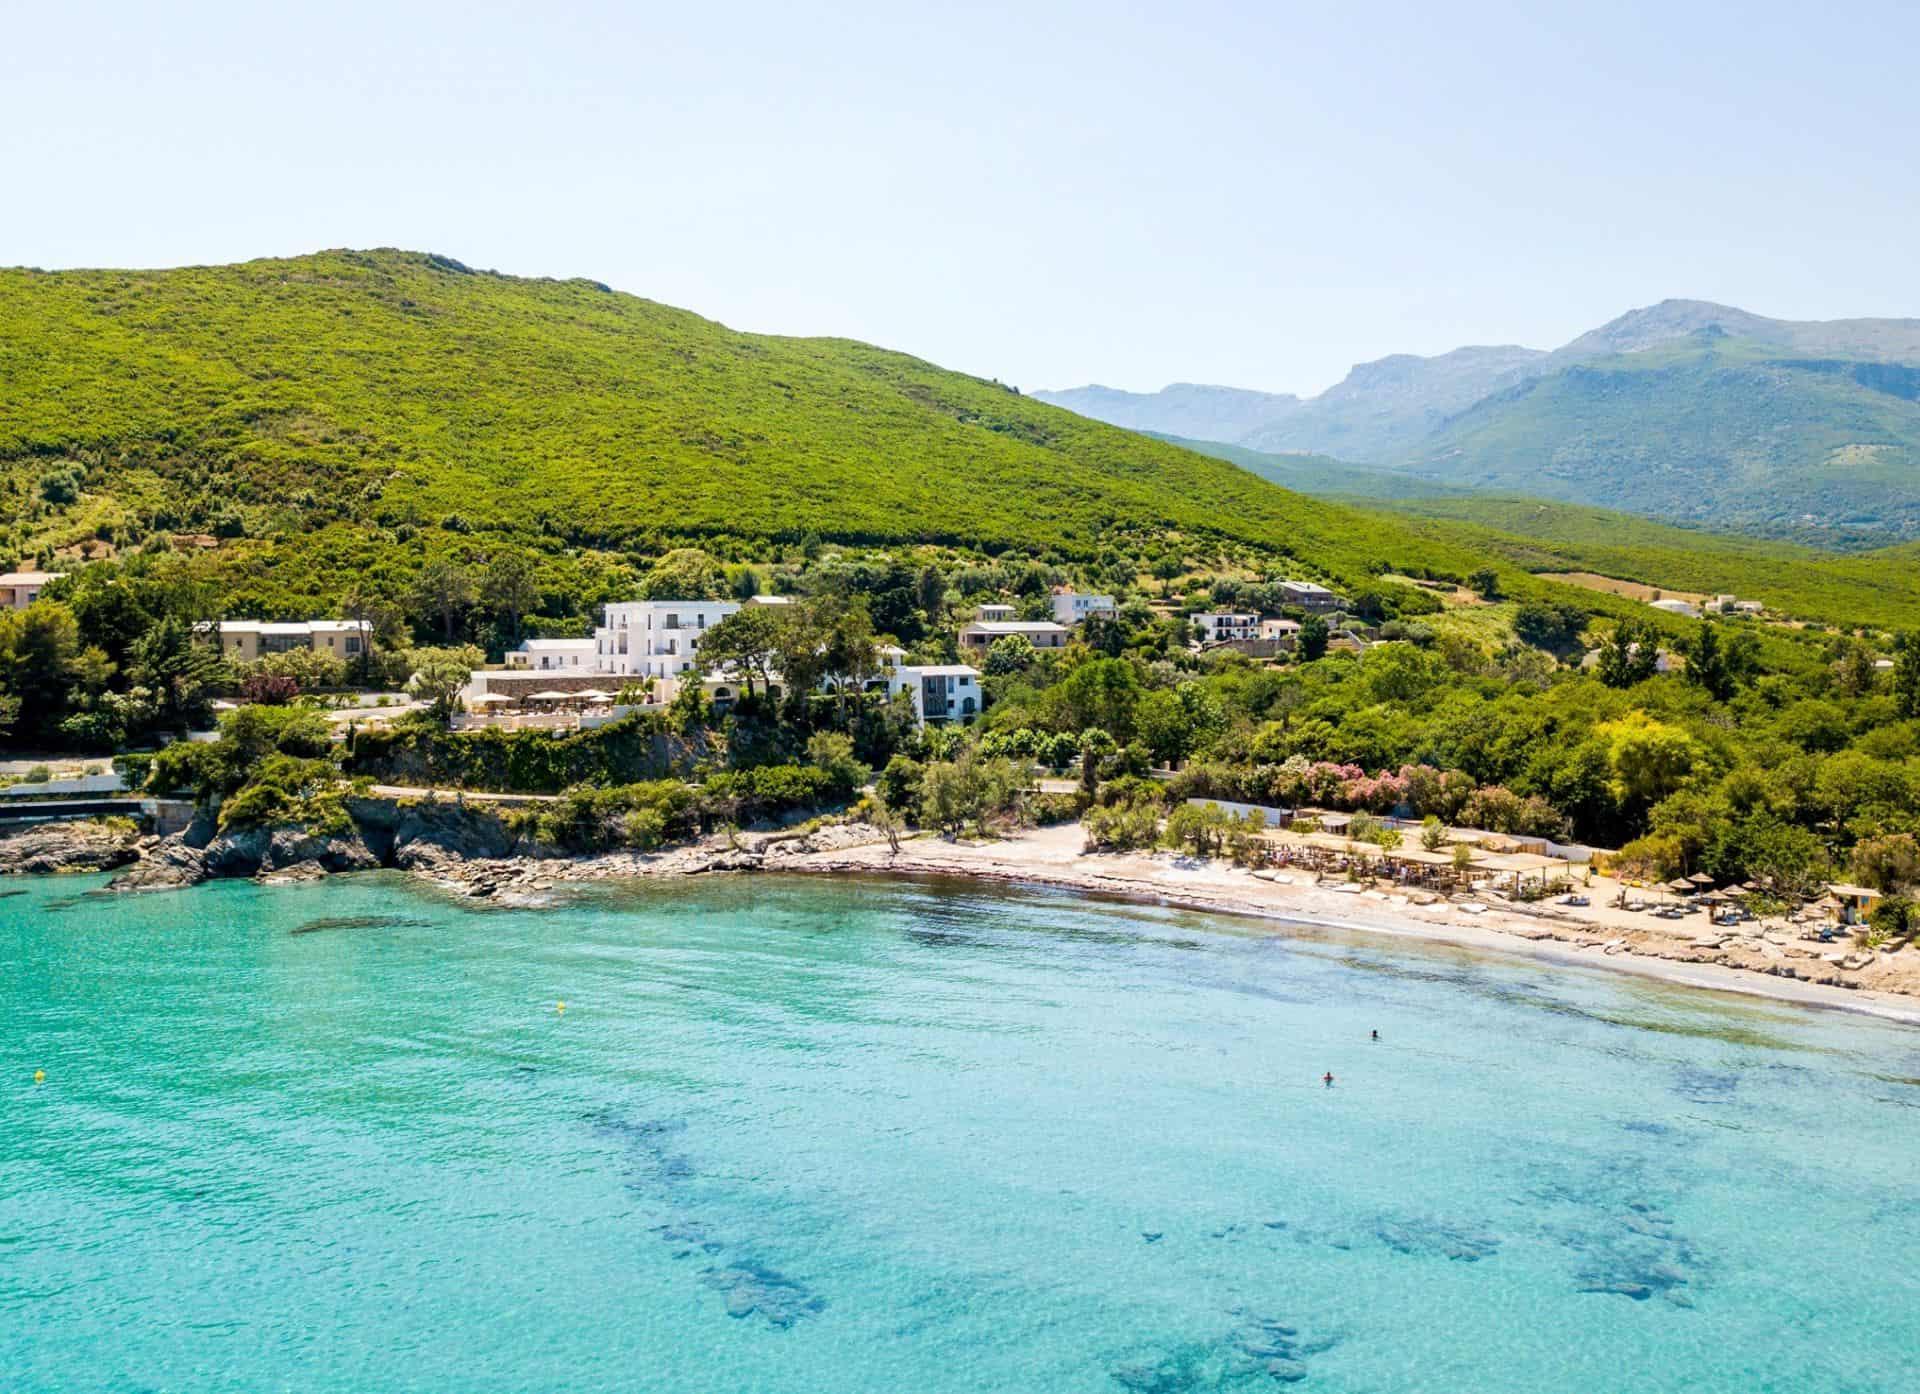 Hotel Misincu Corsica Panorama